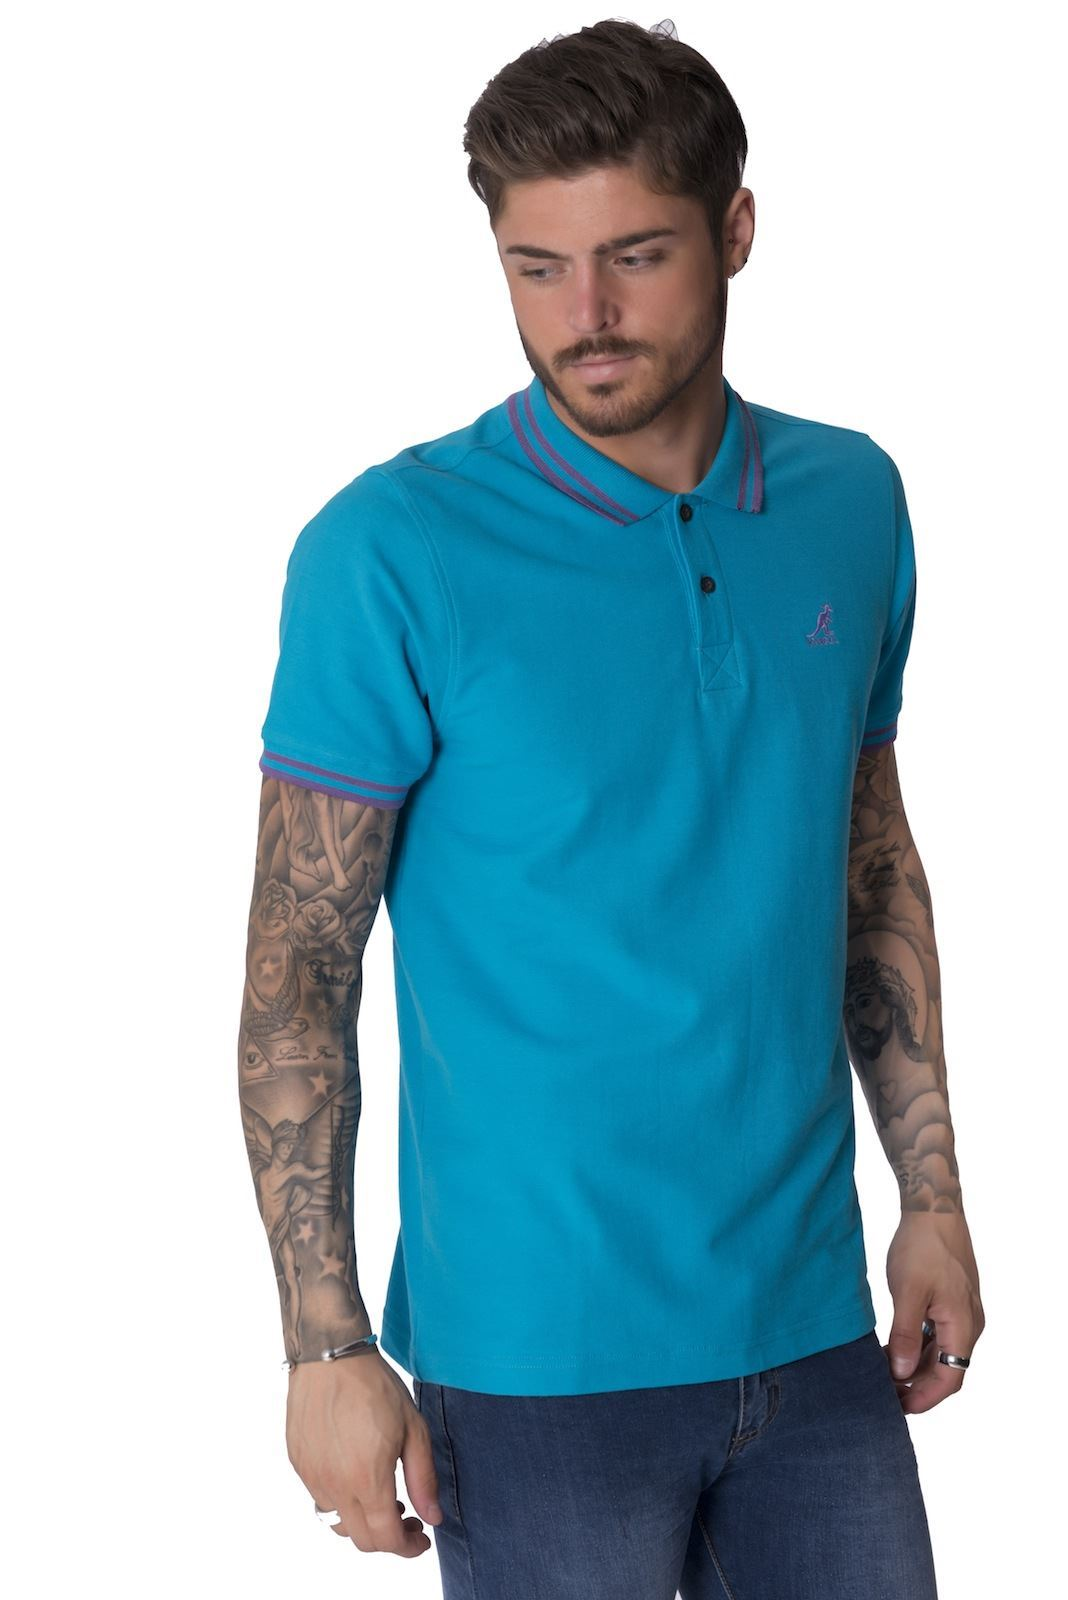 Kangol joshua new big mens plus size short sleeve polo for Plus size men shirts